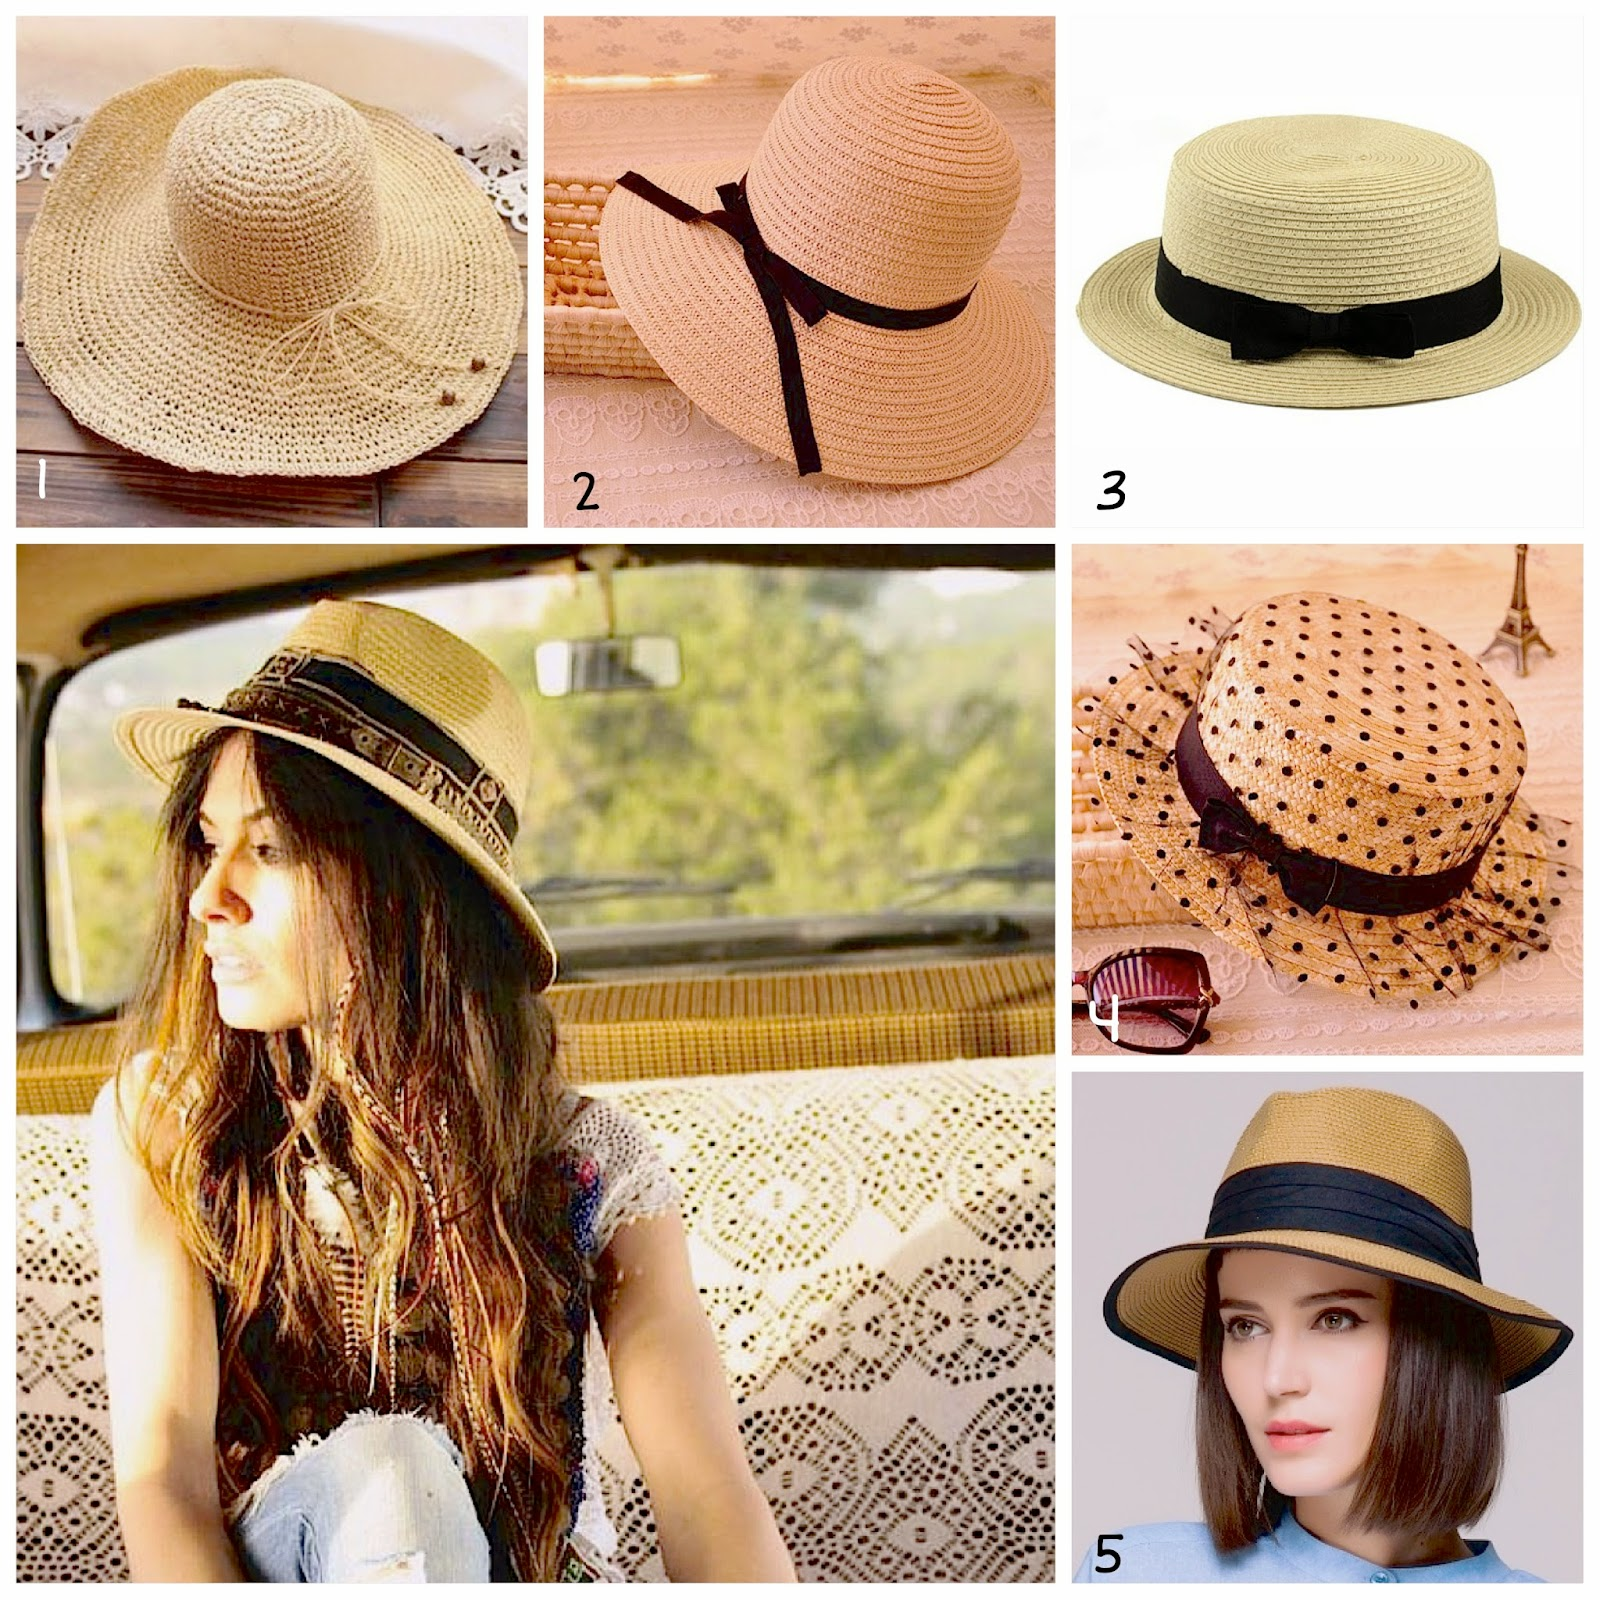 onde comprar chapéu de palha